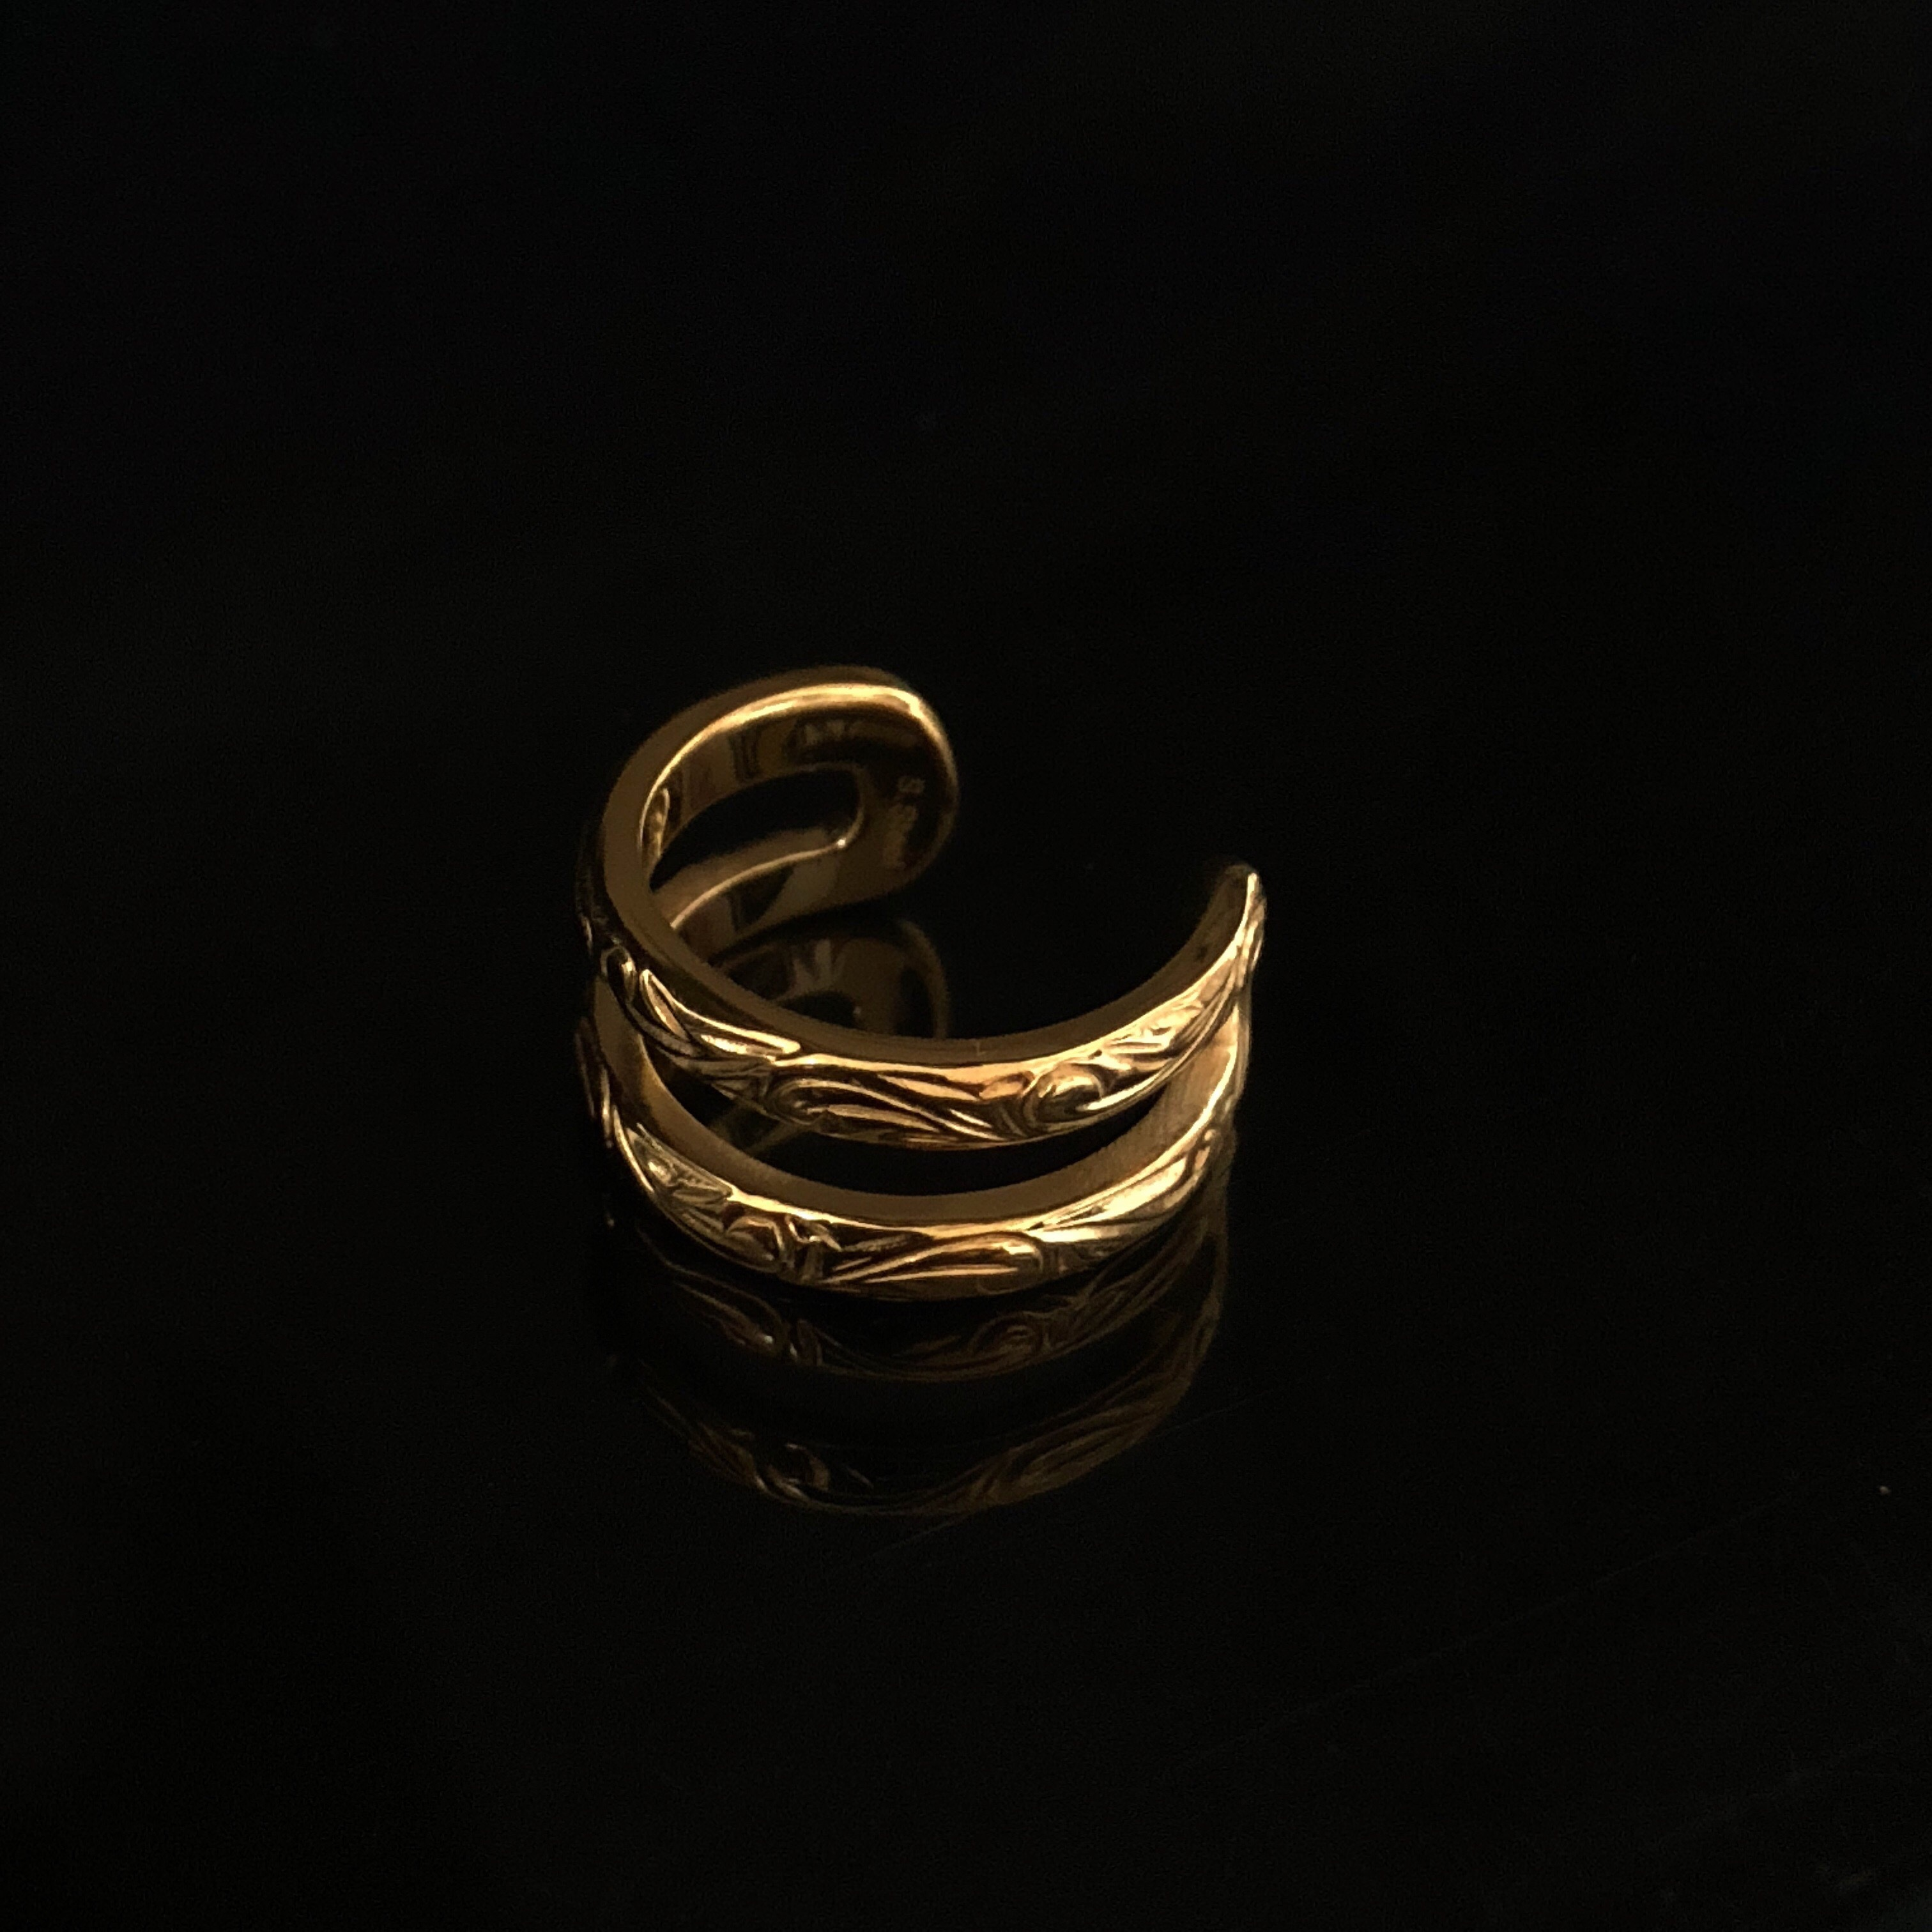 24kgp Hawaiian jewelry ring(double)